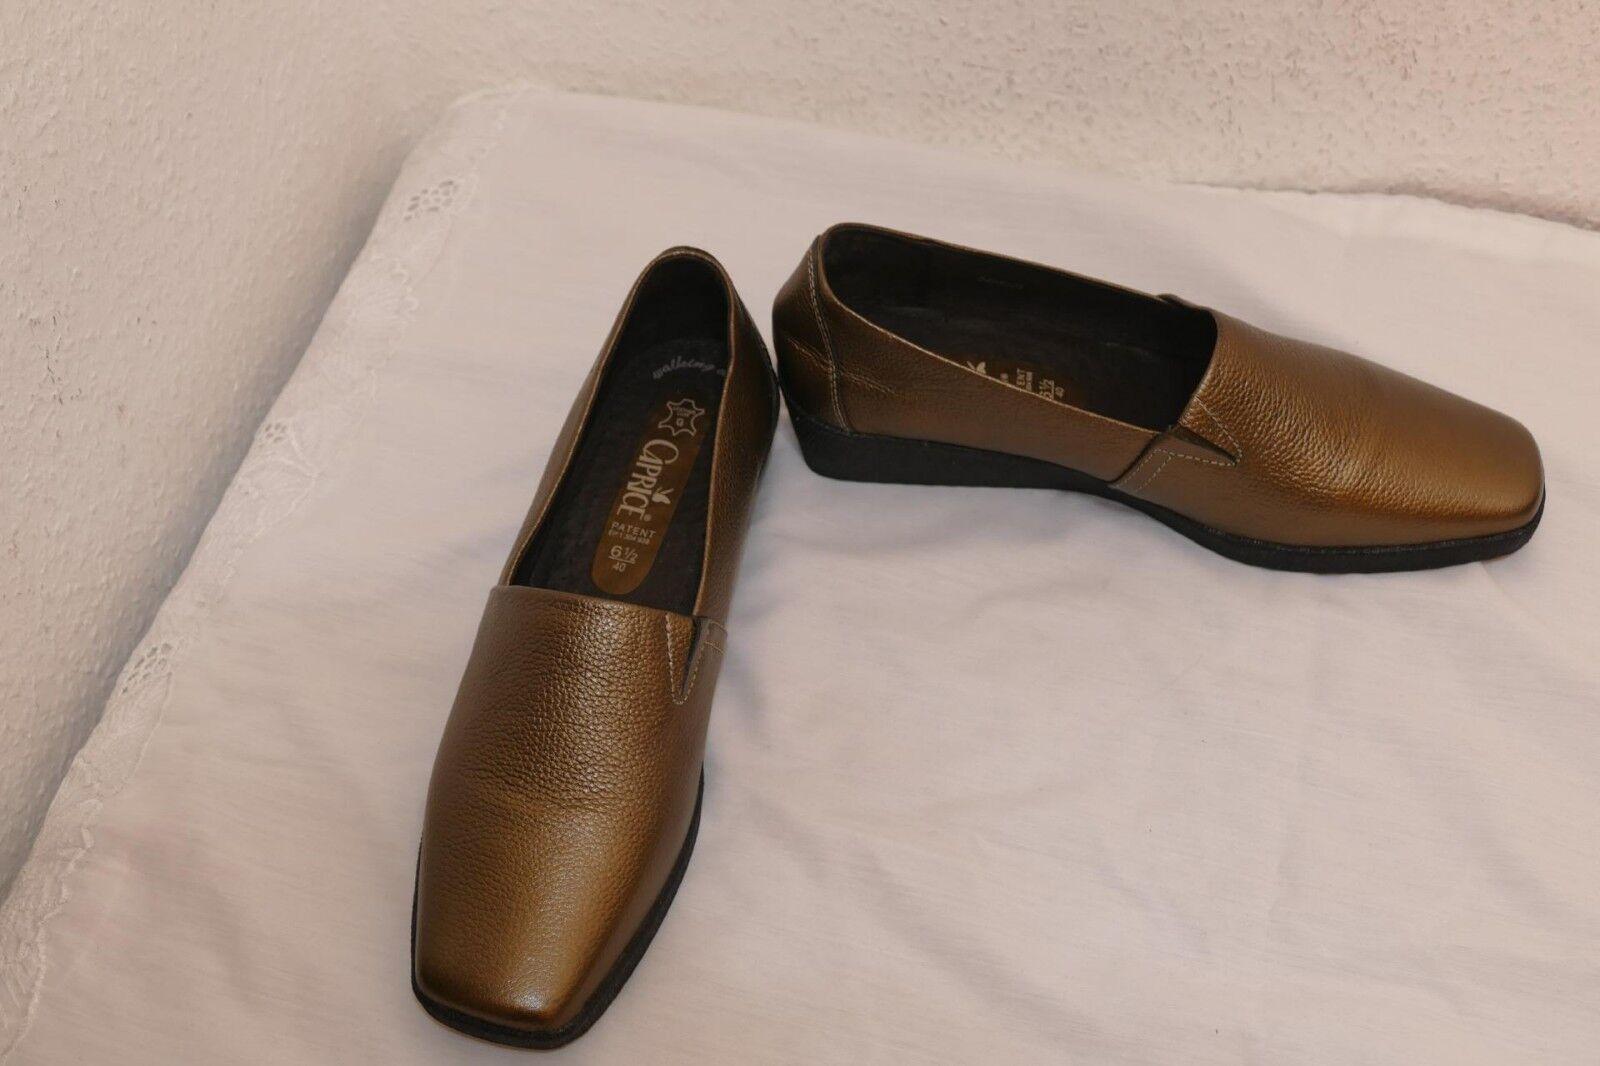 1224---Caprice 1224---Caprice 1224---Caprice Slipper UK 6,5 Gr 40 gold matt Leder aussen + innen + sehr leicht 7dbbc9